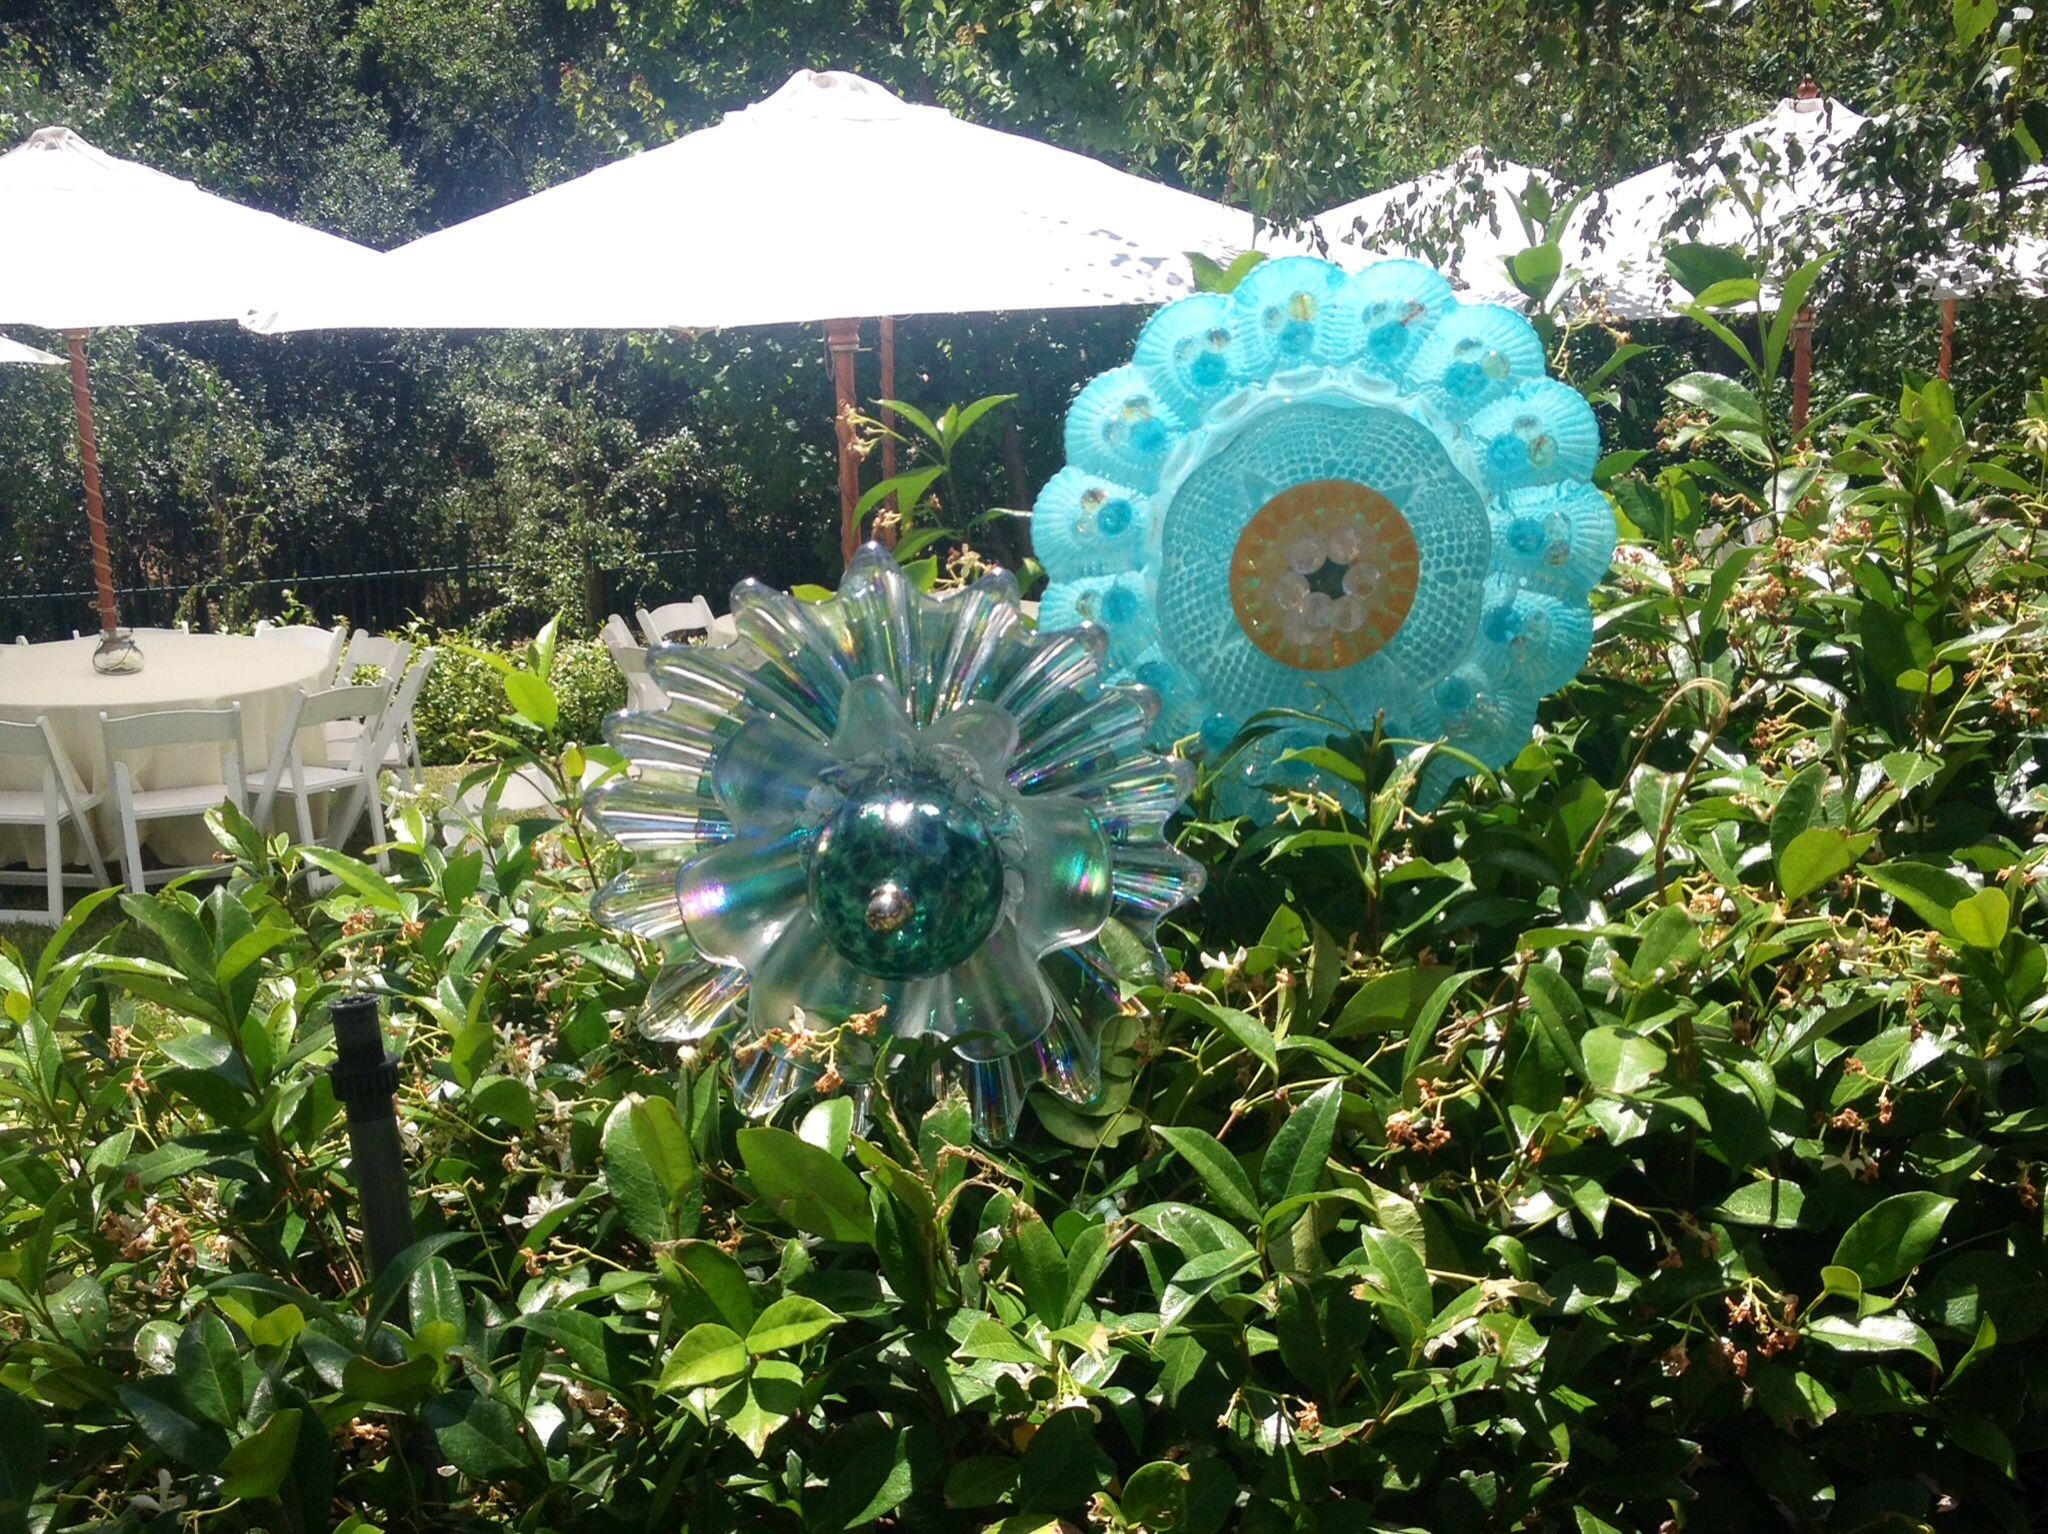 Glass yard art  Recycled glass flowers  Glass Yard Art  Pinterest